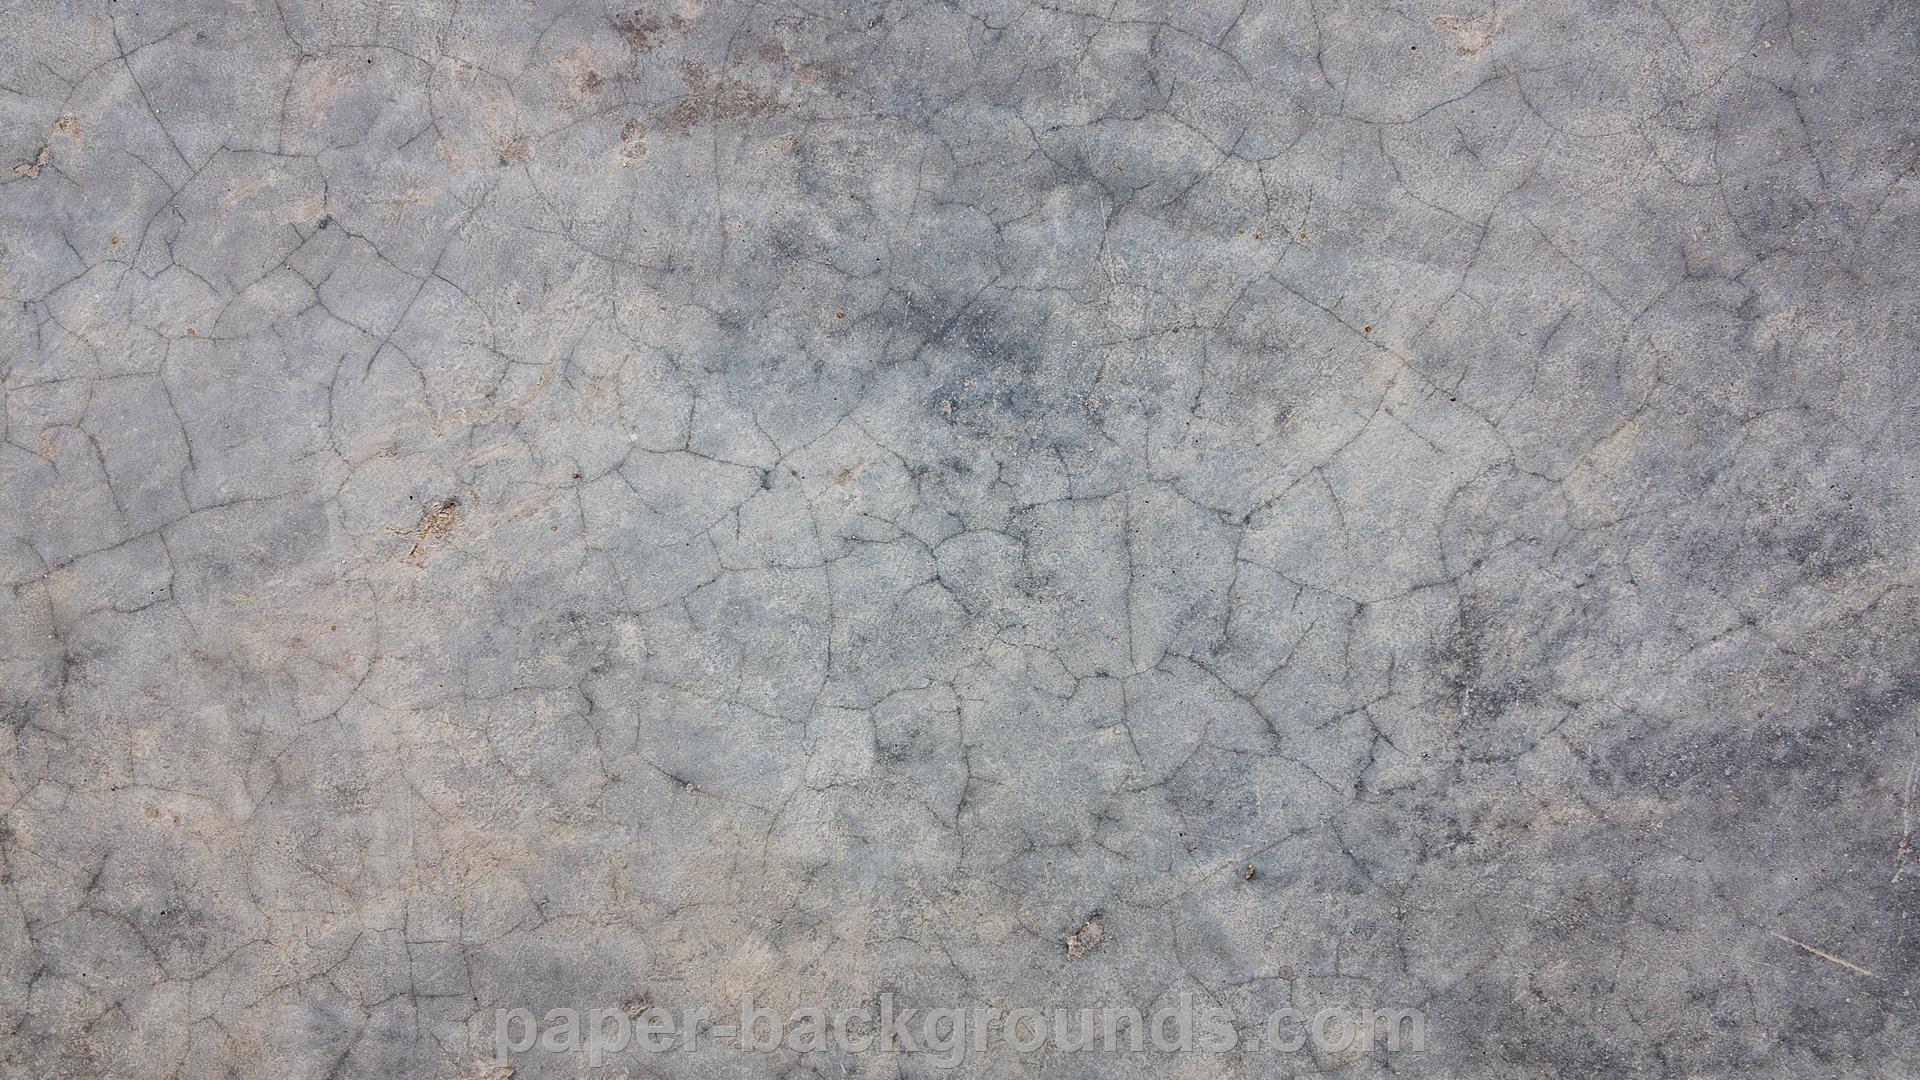 Textured Concrete Wallpaper Wallpapersafari